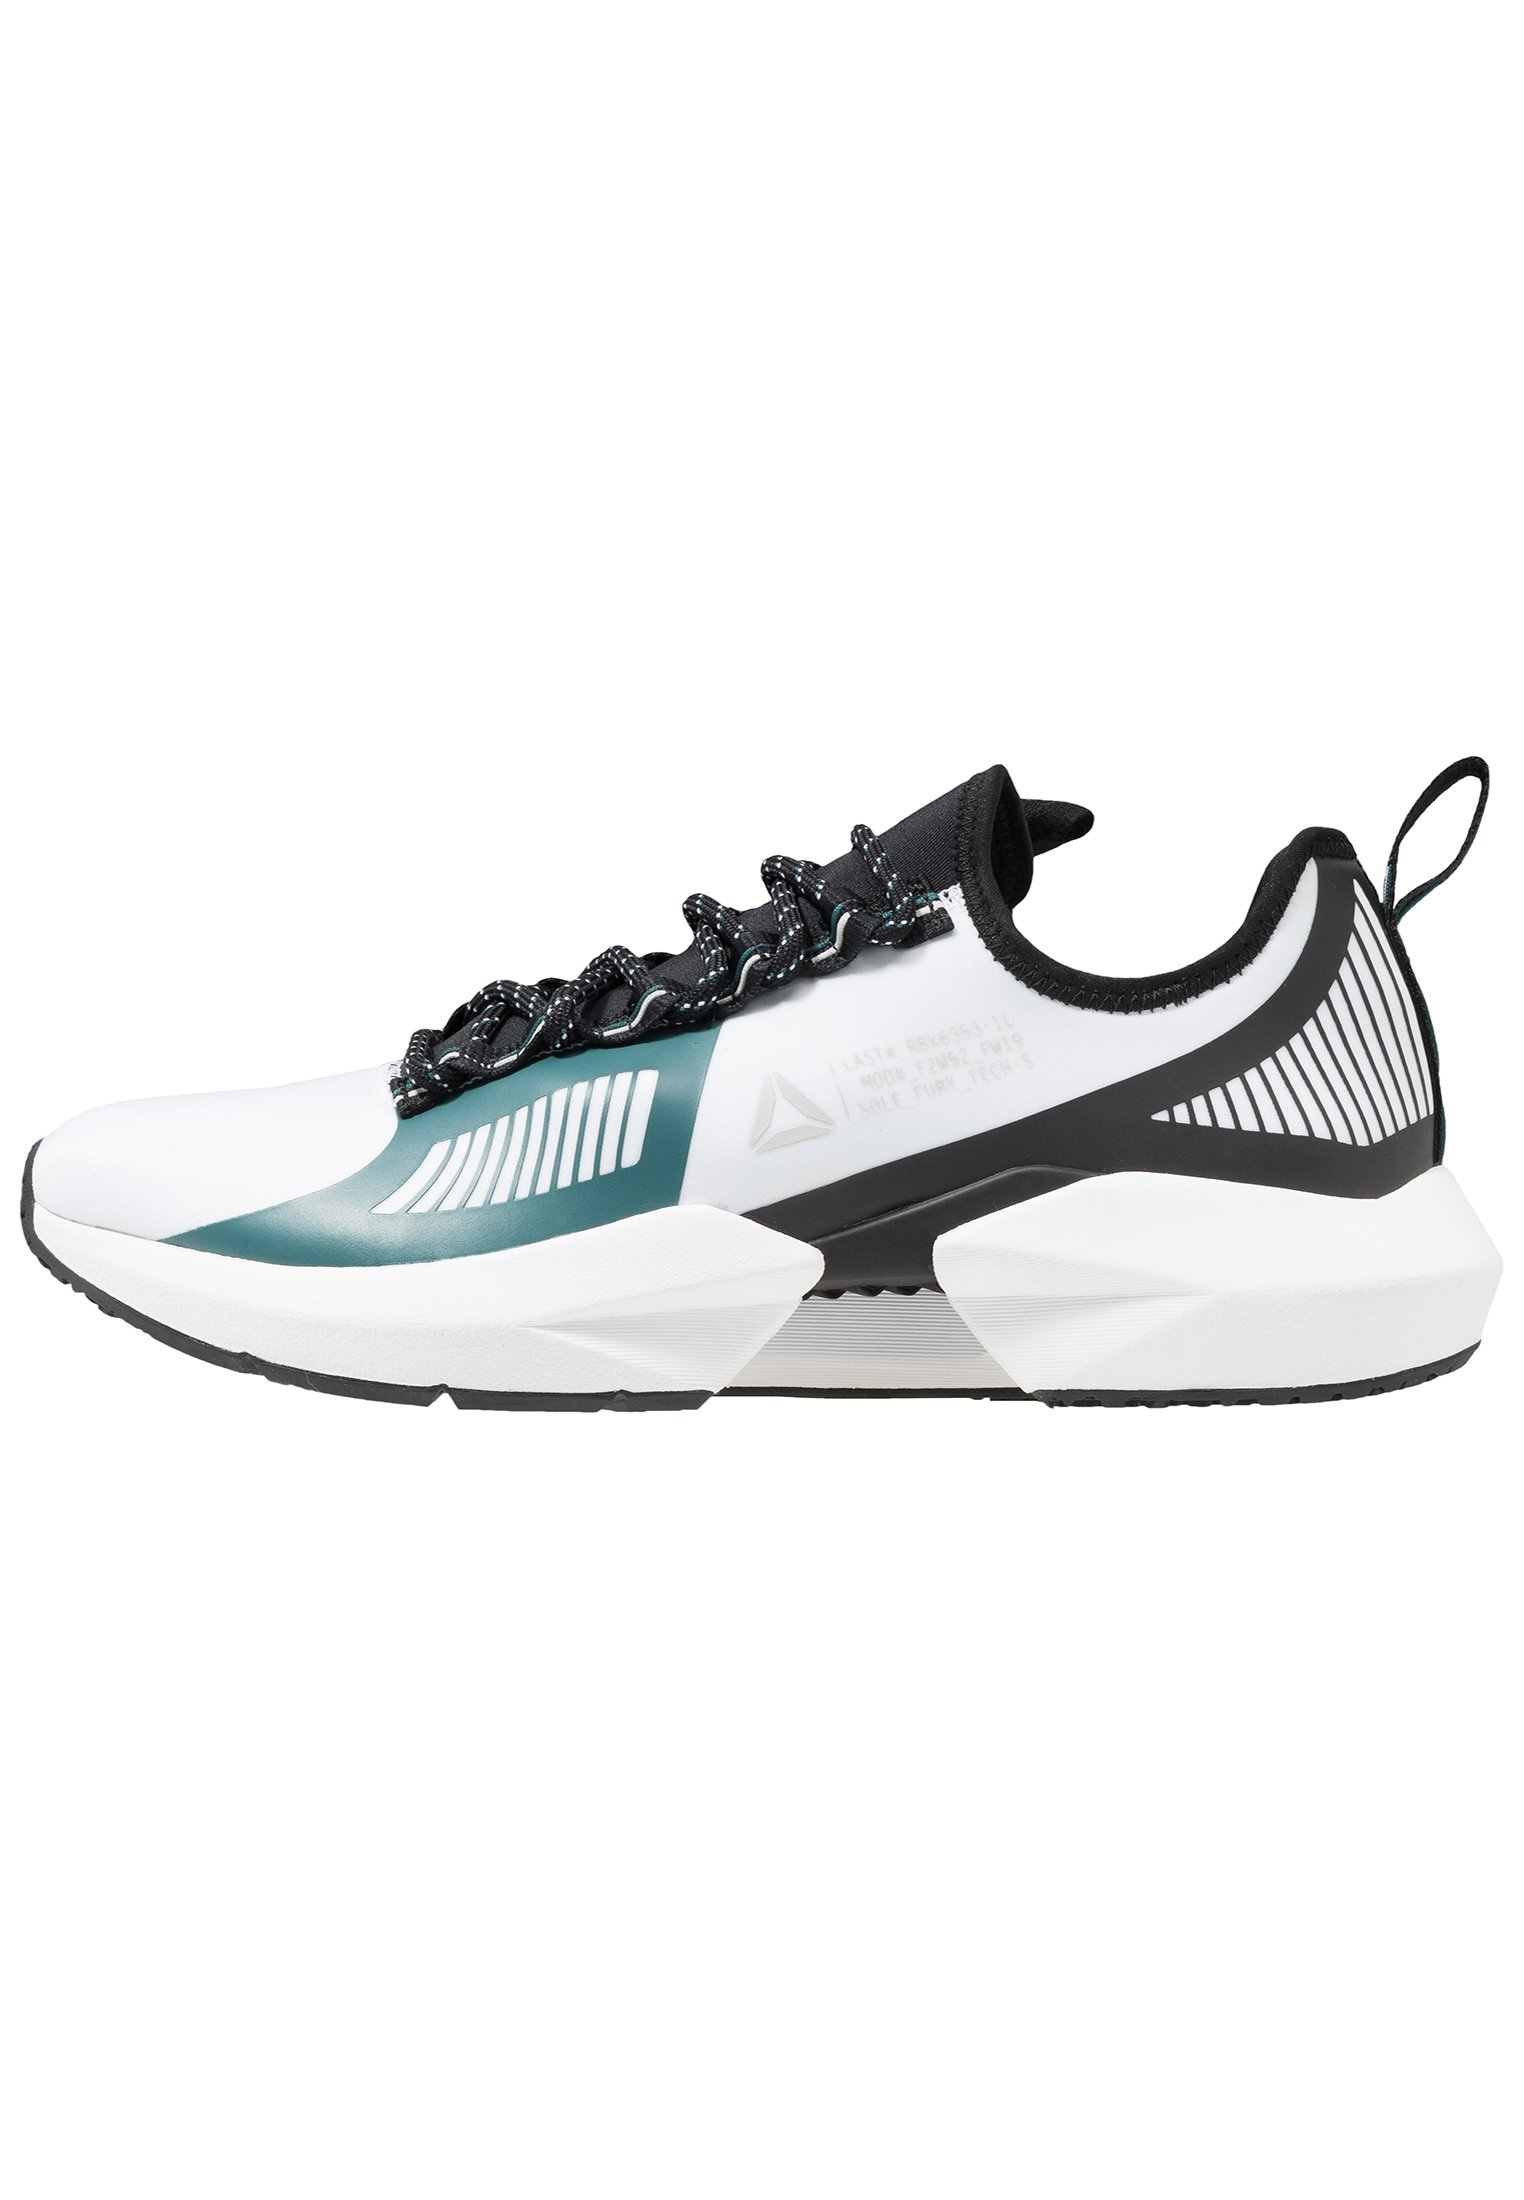 SOLE FURY TS Scarpe da fitness whiteblackgreen